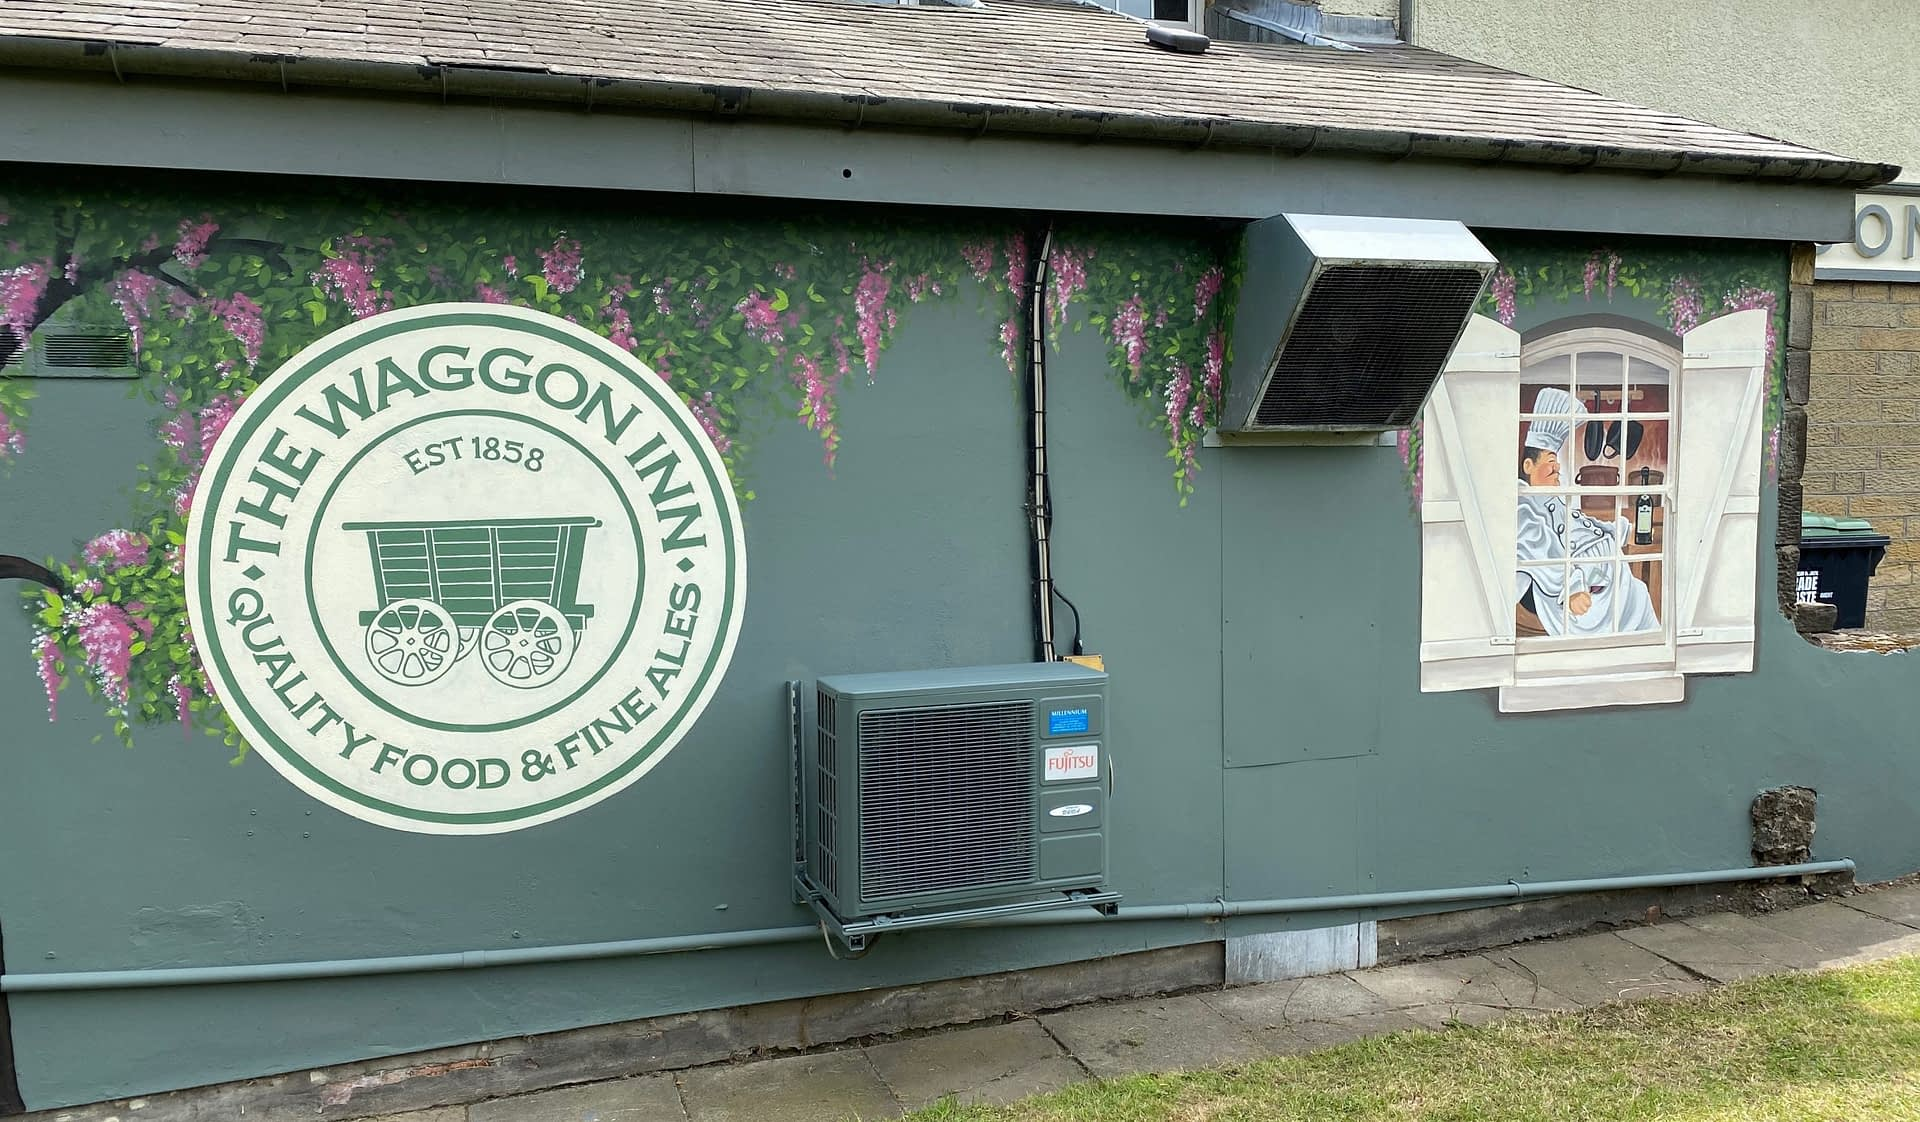 The Waggon Inn Beer Garden 1